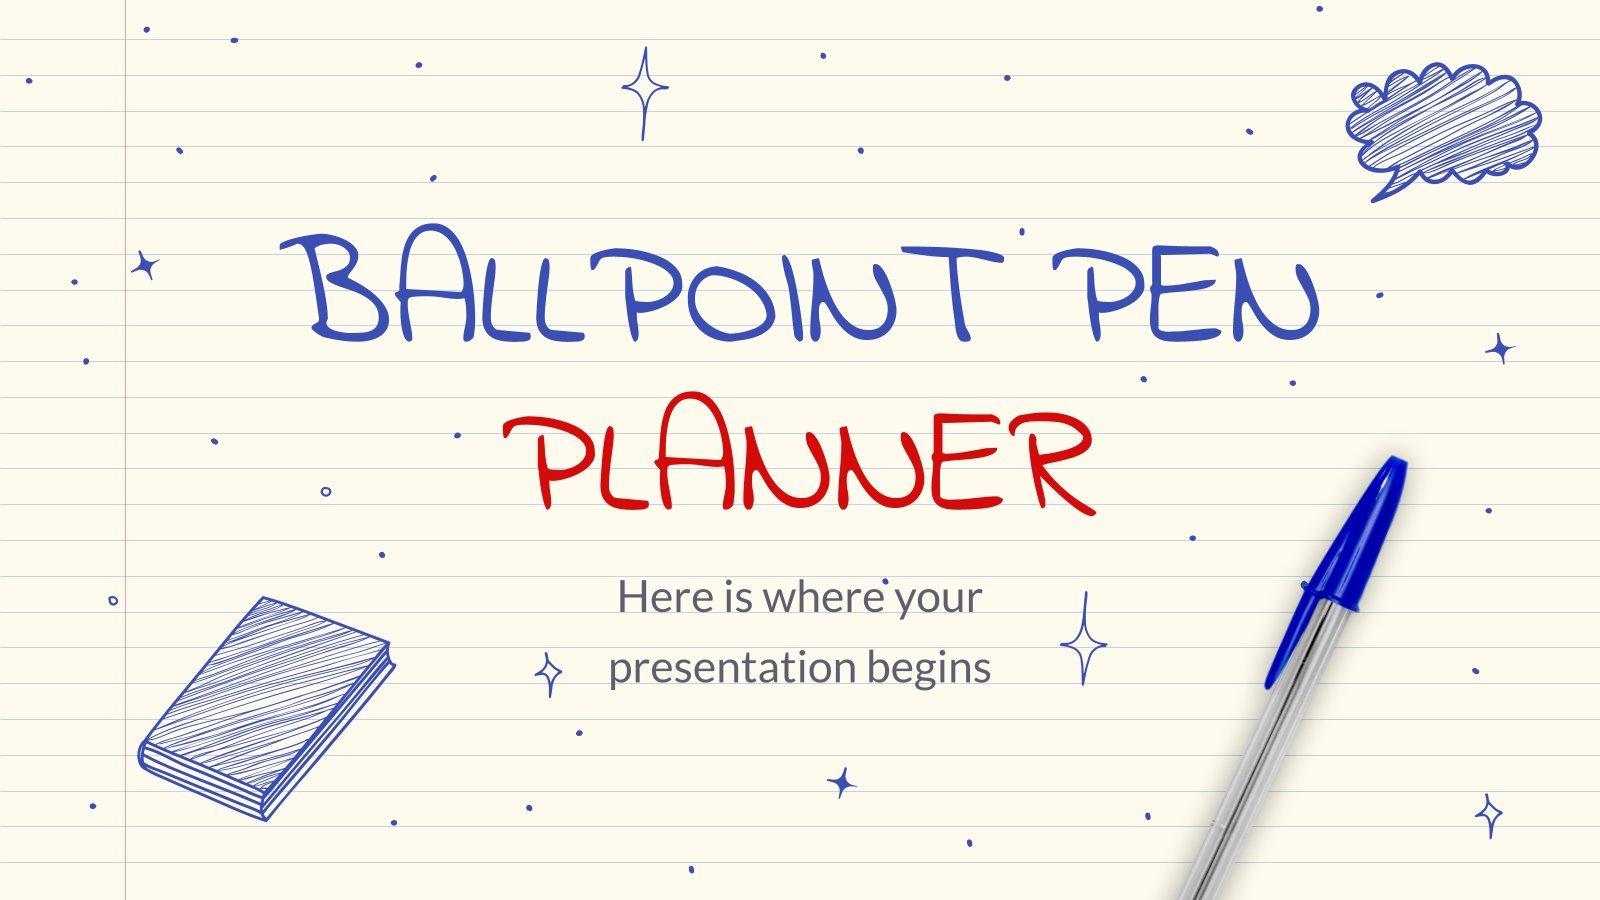 Ballpoint Pen Planner presentation template